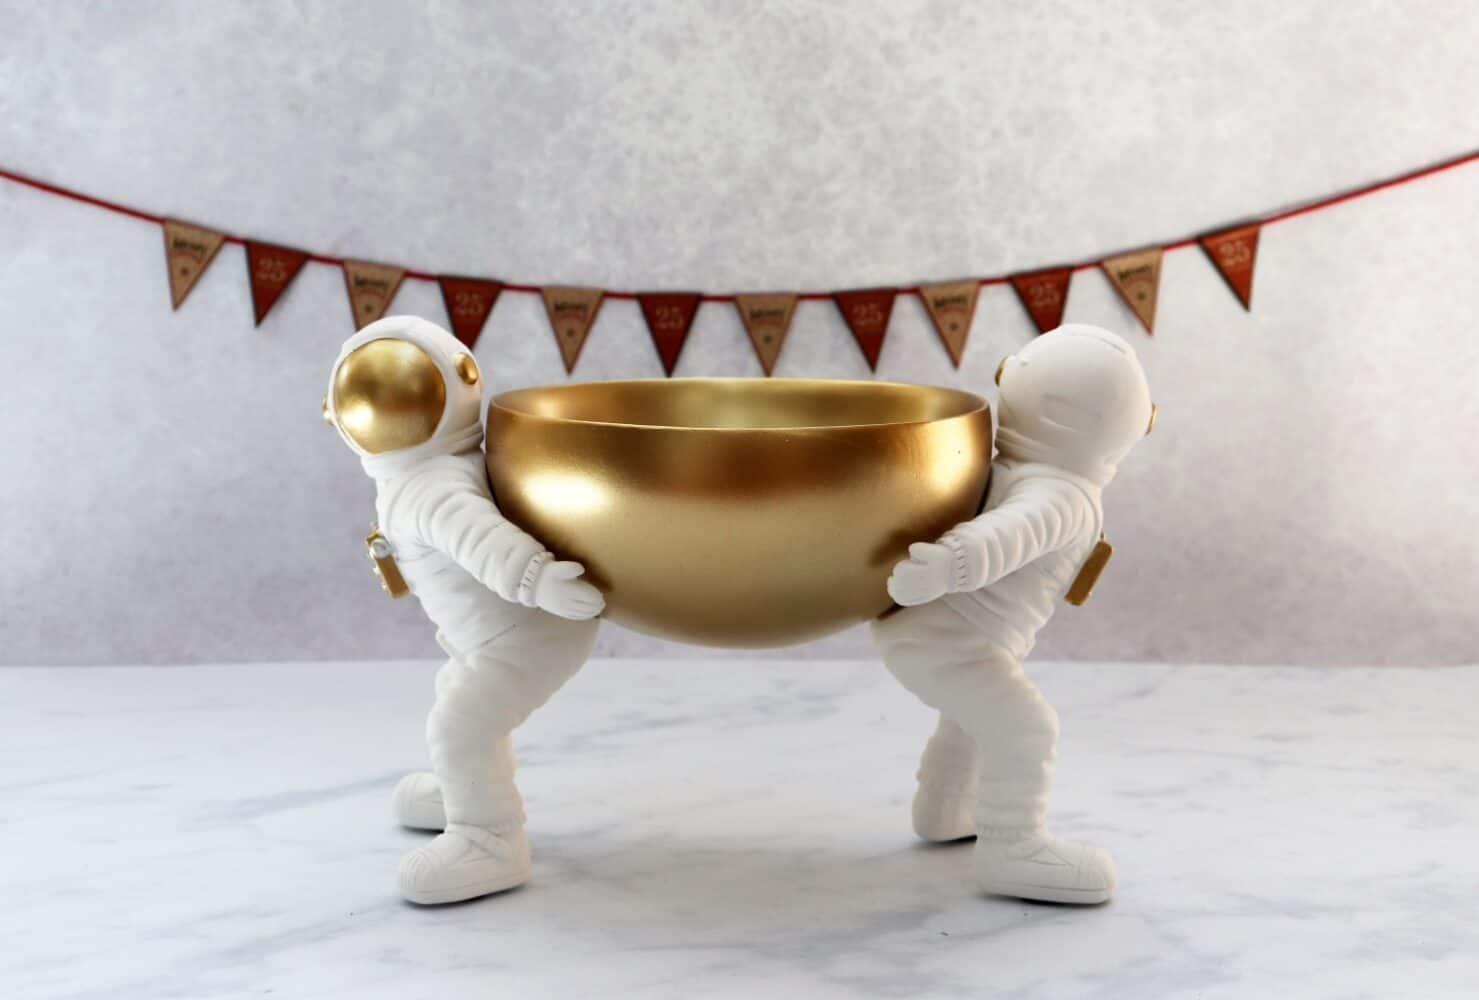 Spacewalk Fruit Bowl